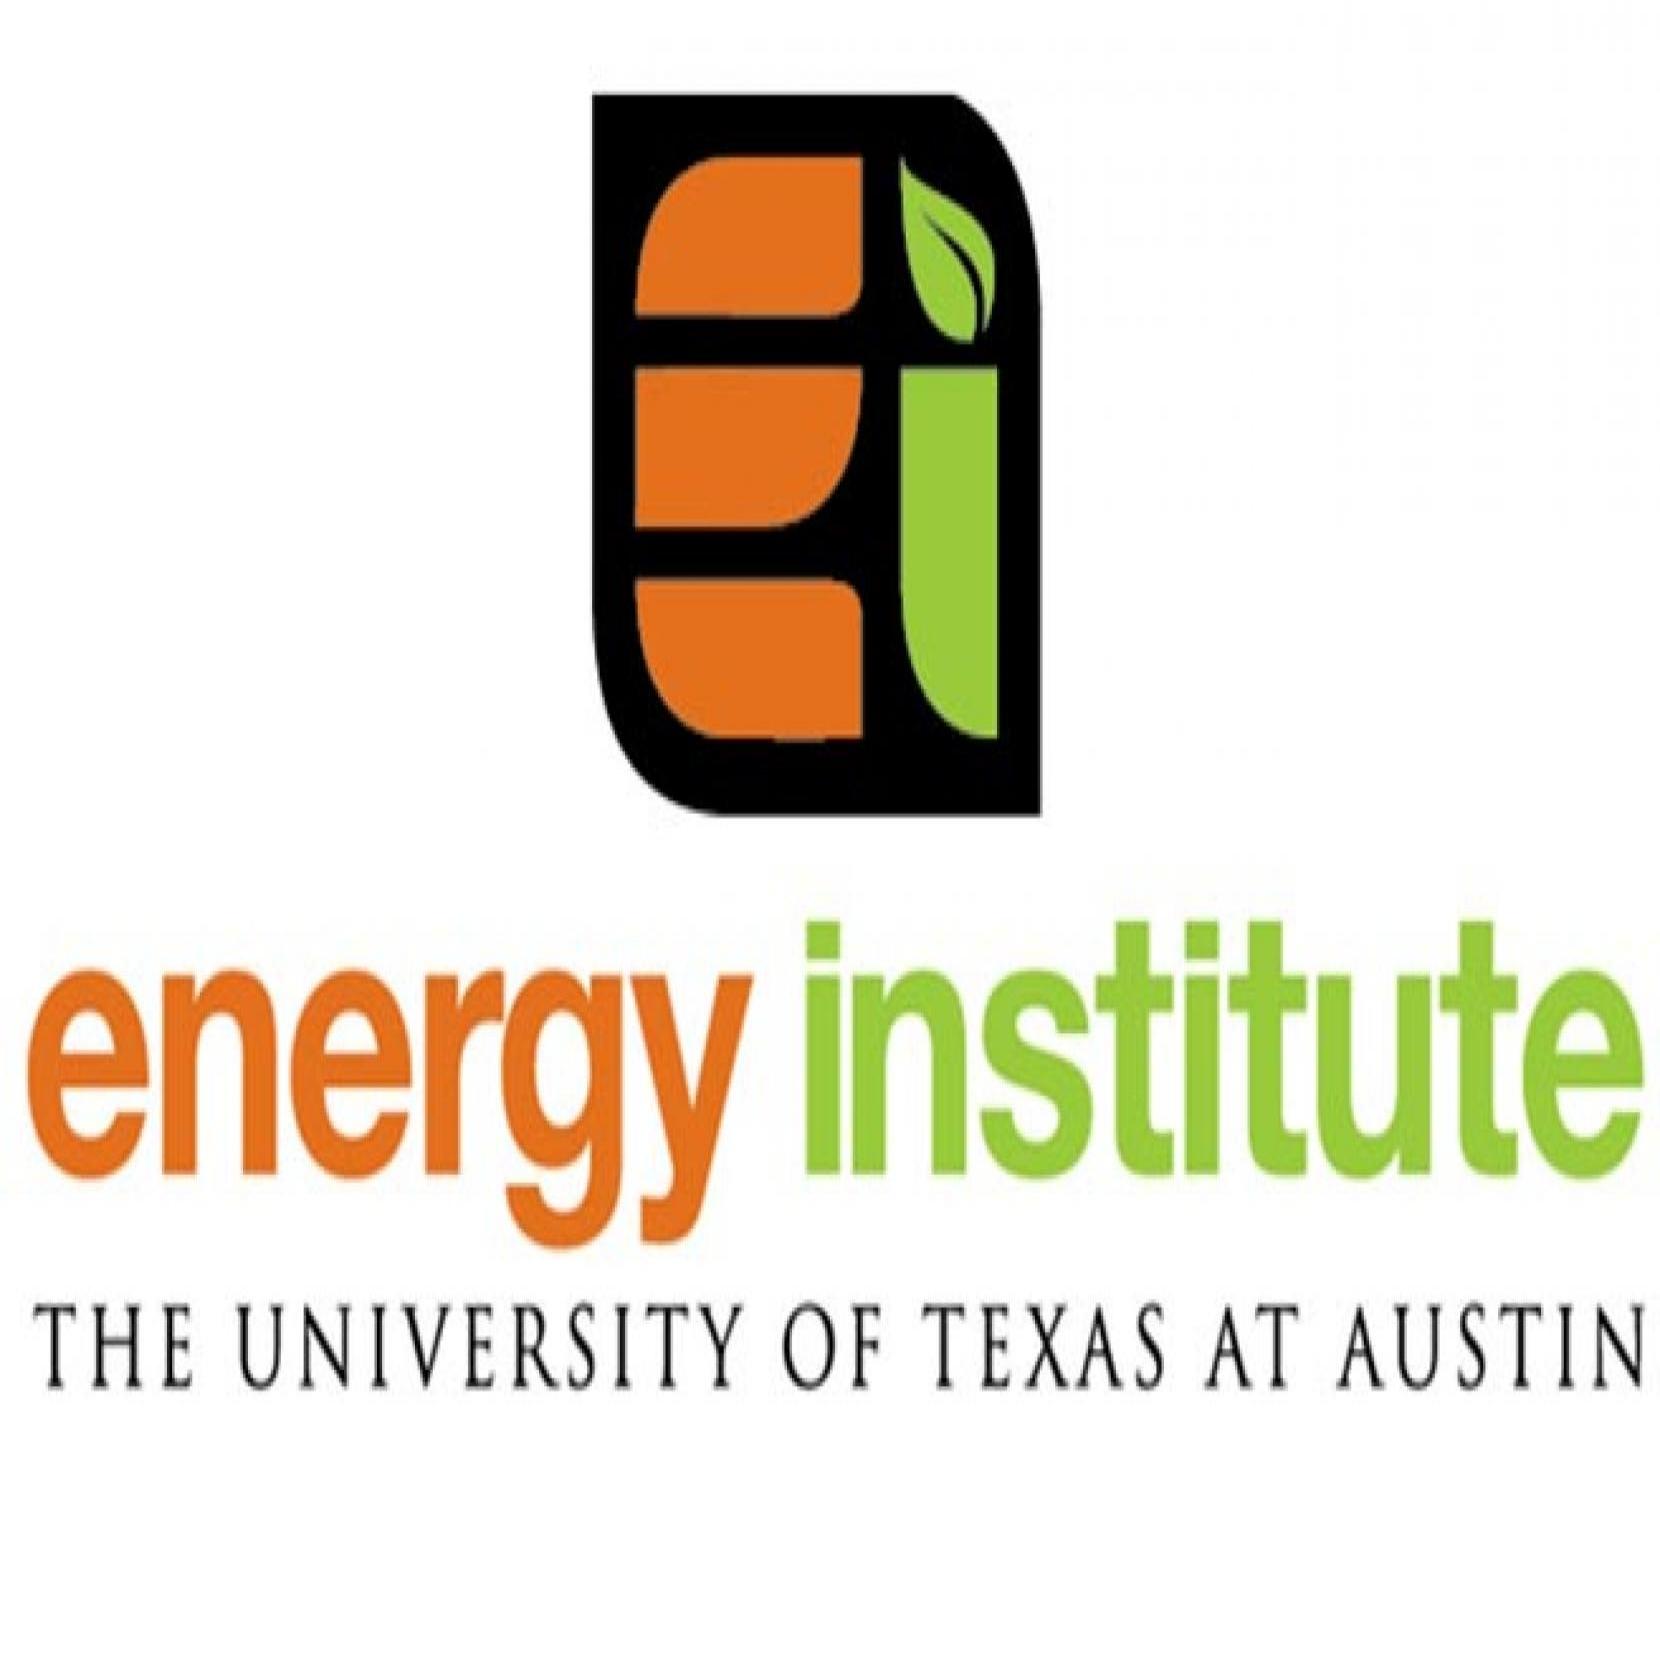 Energy Institute University of Texas at Austin.jpg